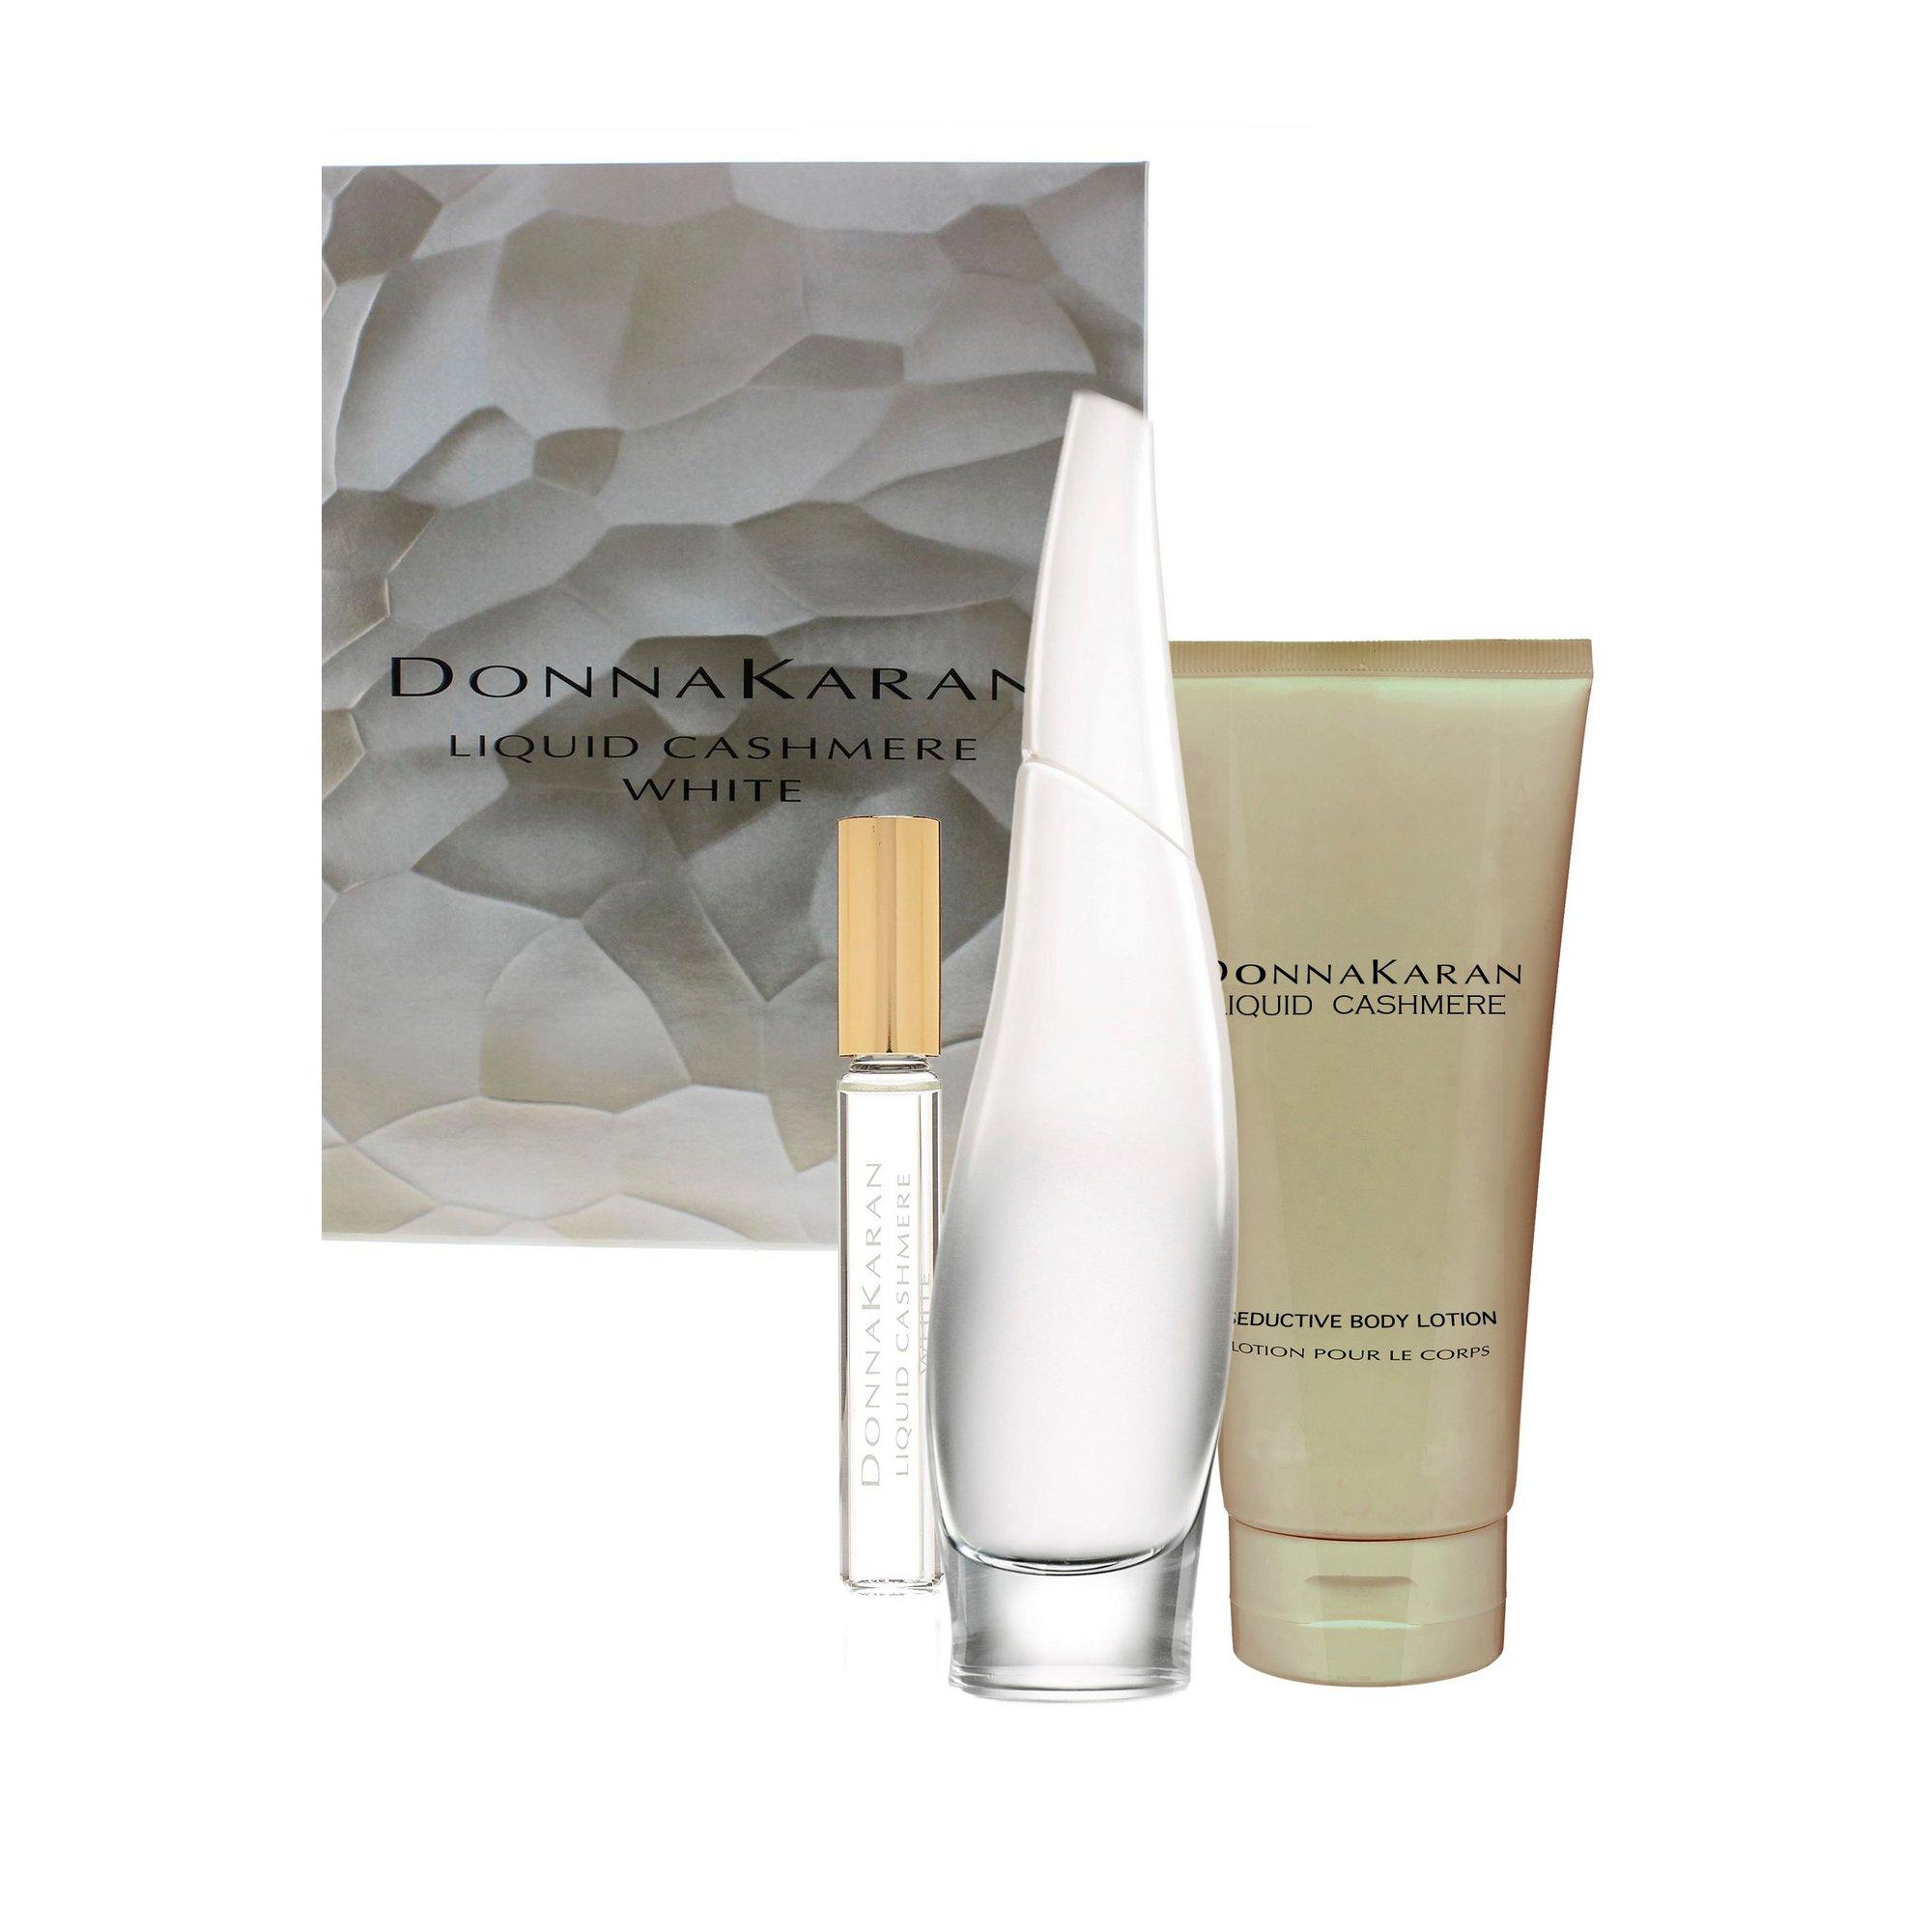 Image of DKNY Liquid Cashmere White 100ml EDP Gift Set